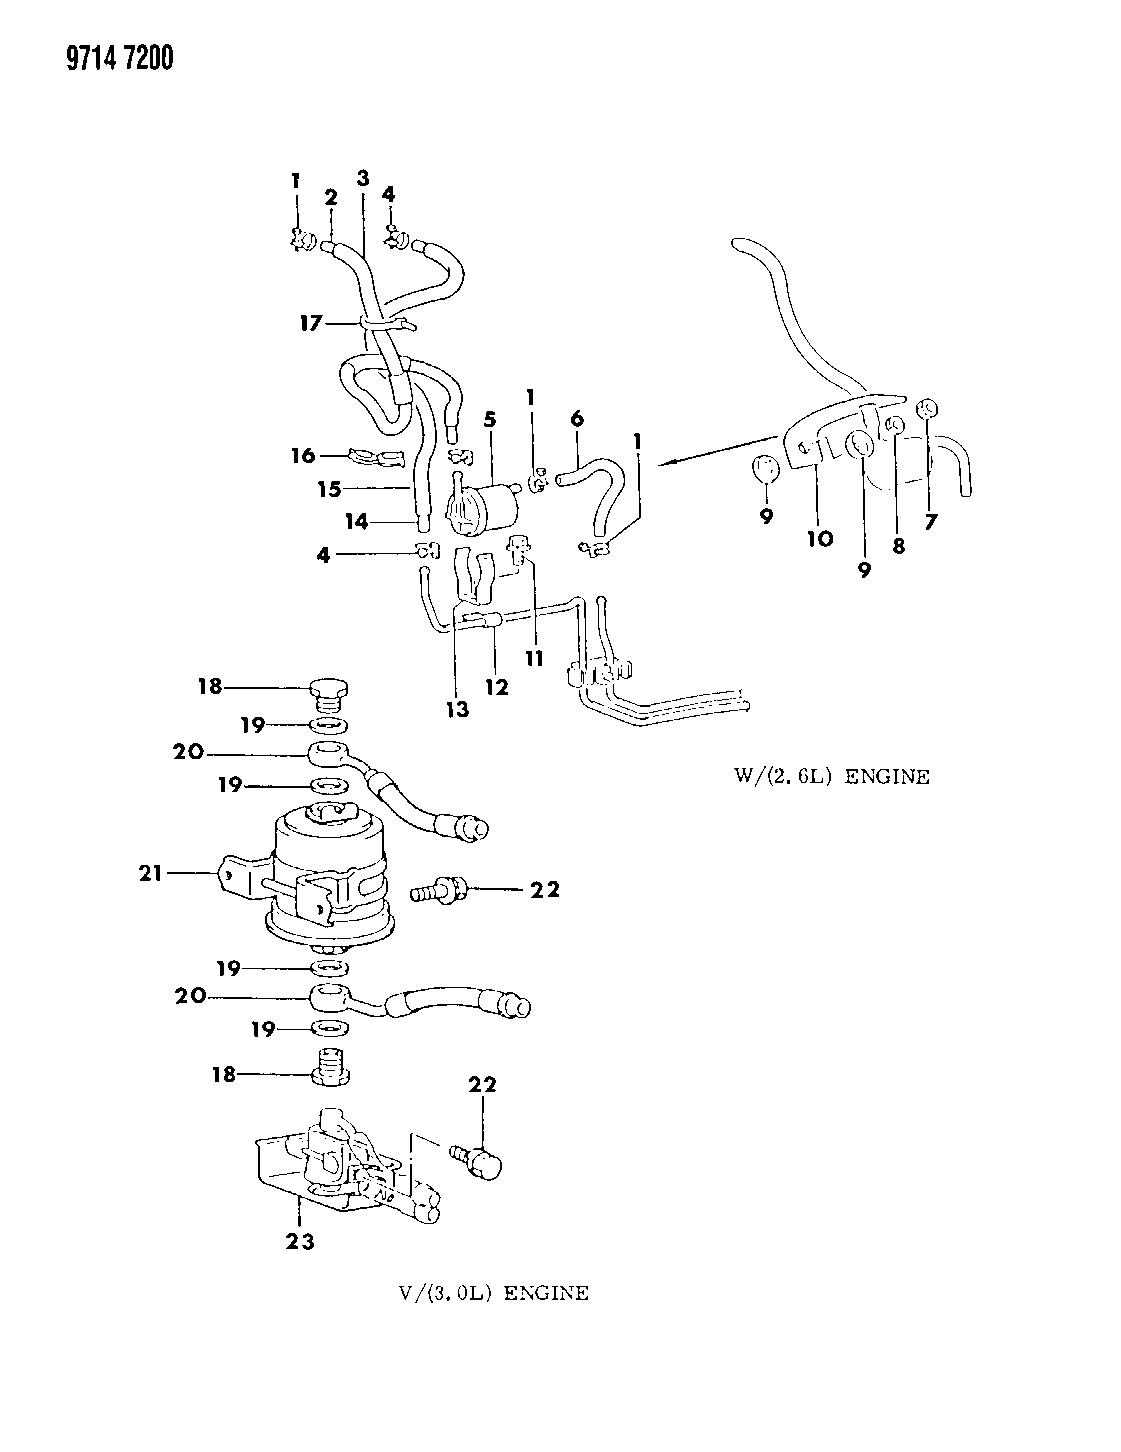 Dodge Raider Fuel Filter